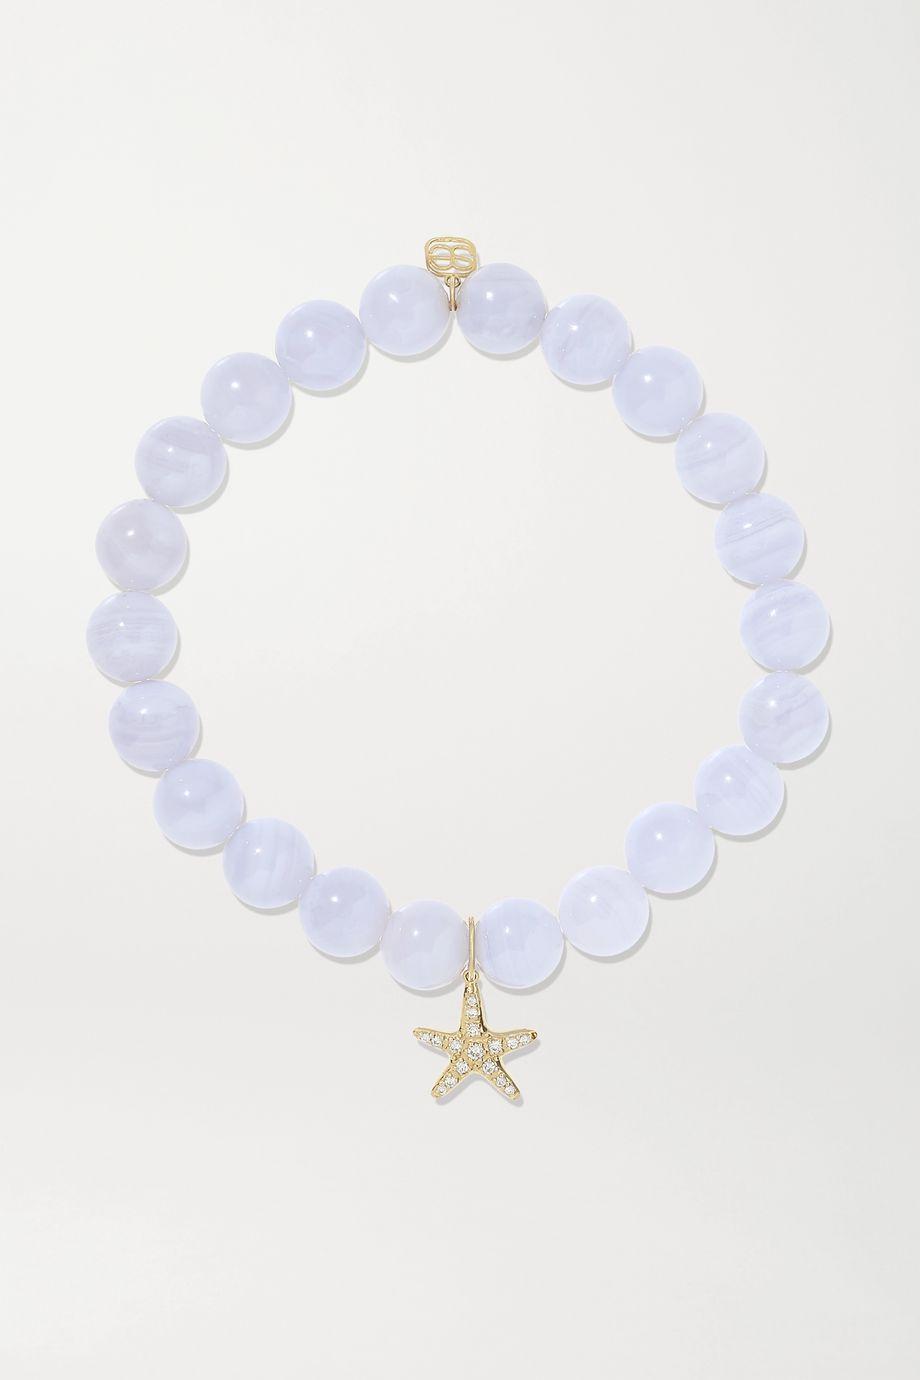 Sydney Evan 14-karat gold, agate and diamond bracelet